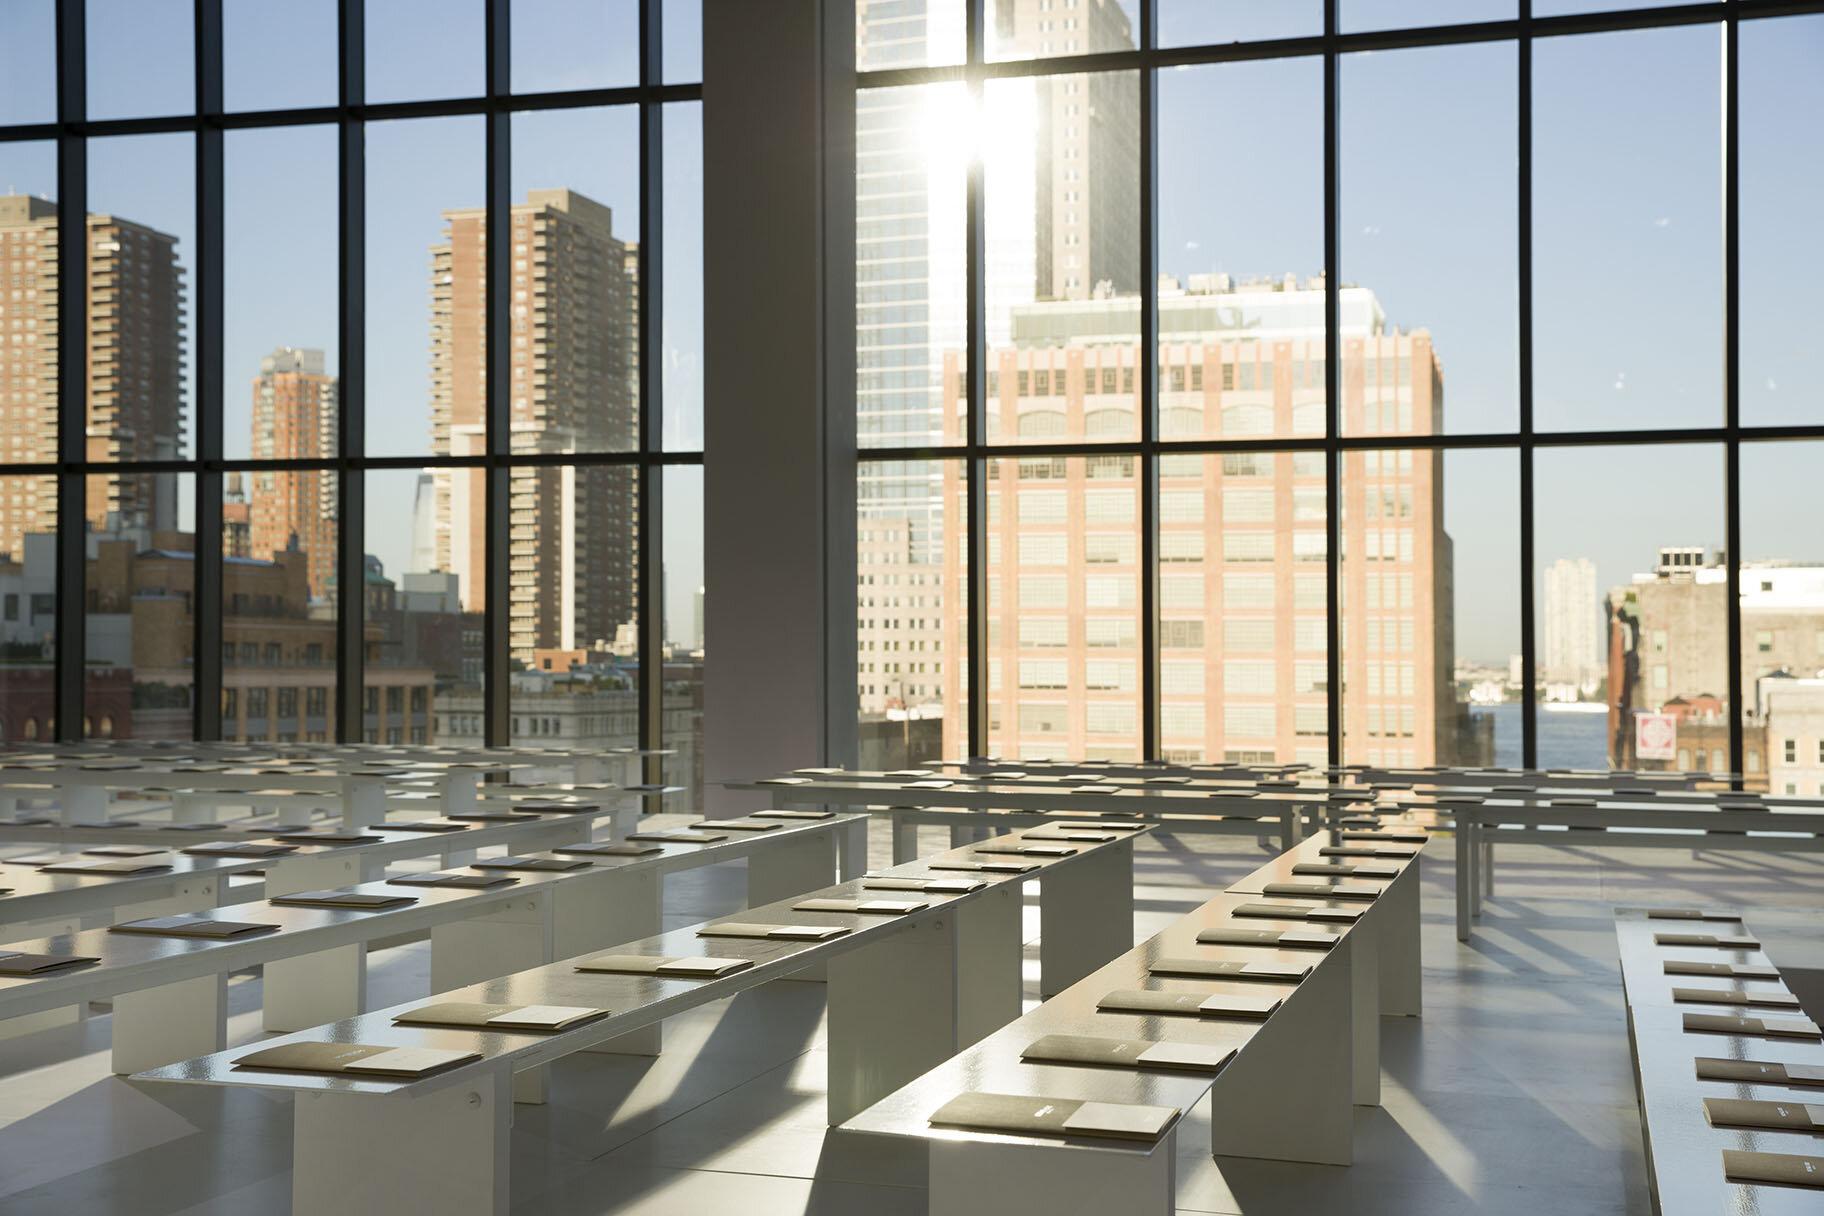 bureau-betak-michael-kors-new-york-gallery-guillaume-ziccarelli-04.jpg